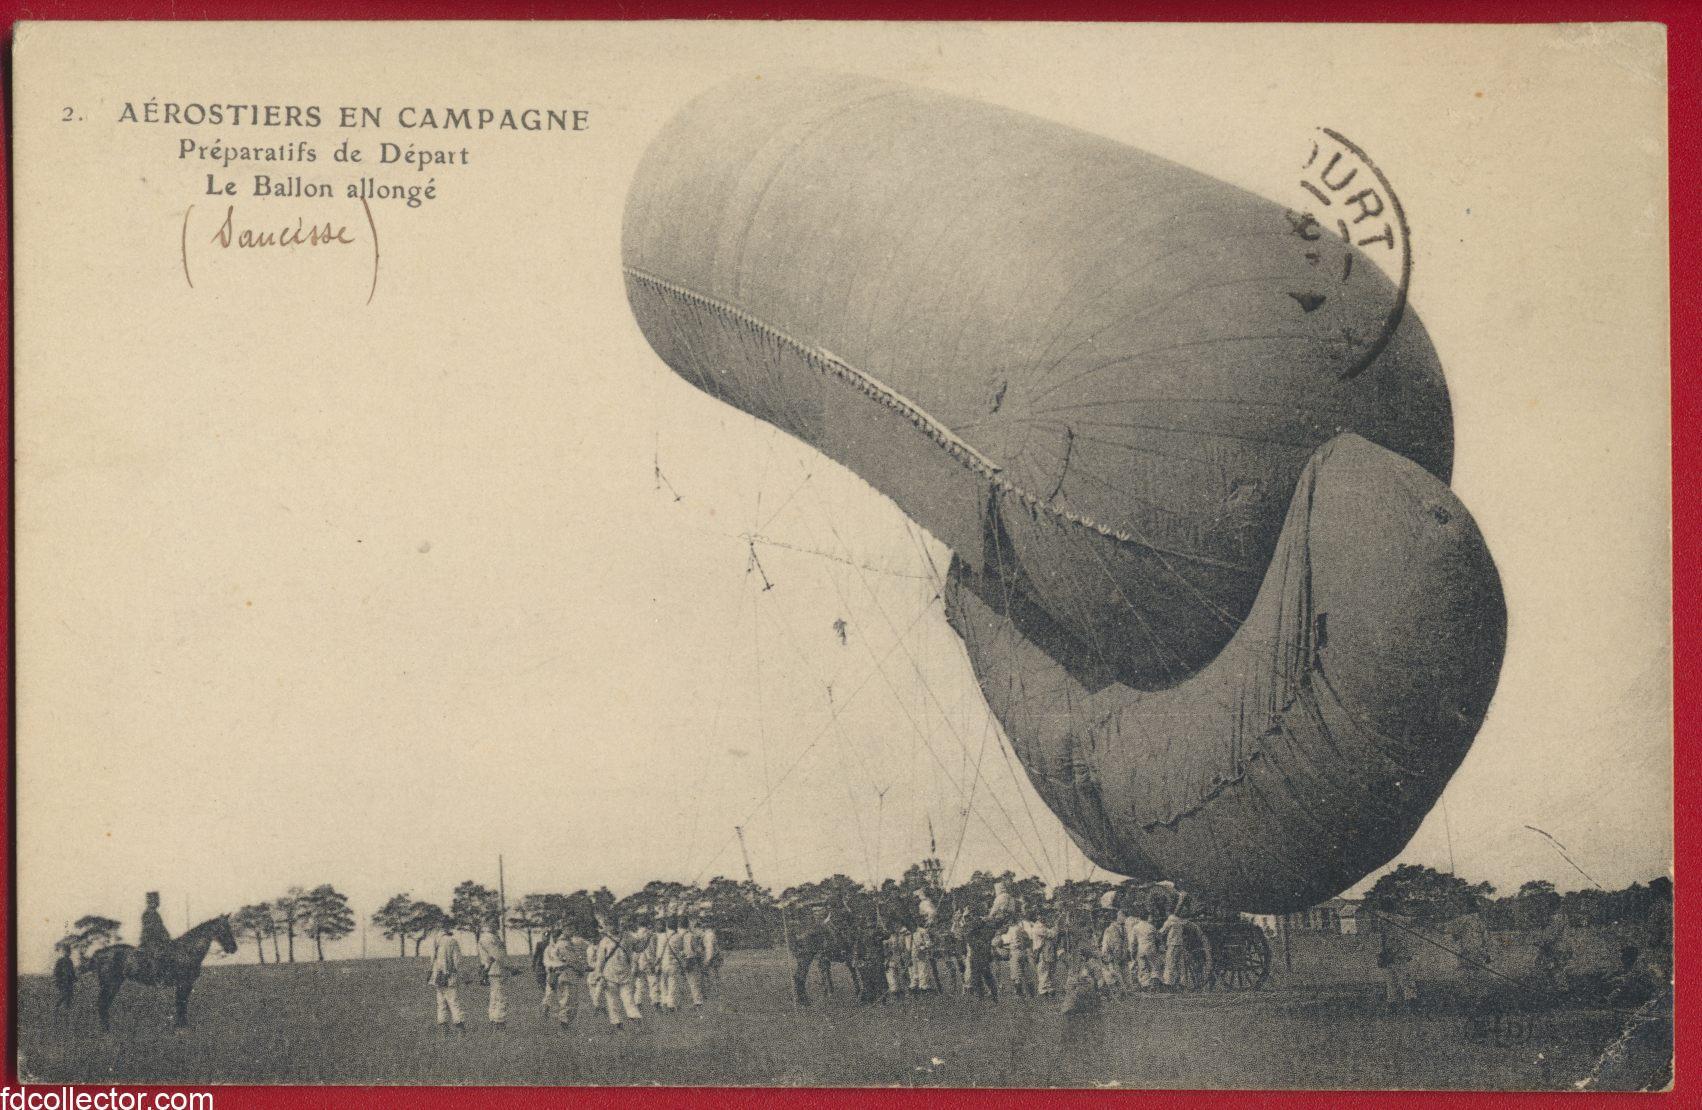 cpa-aerostiers-campagne-preparatifs-depart-ballon-allonge-saucisse